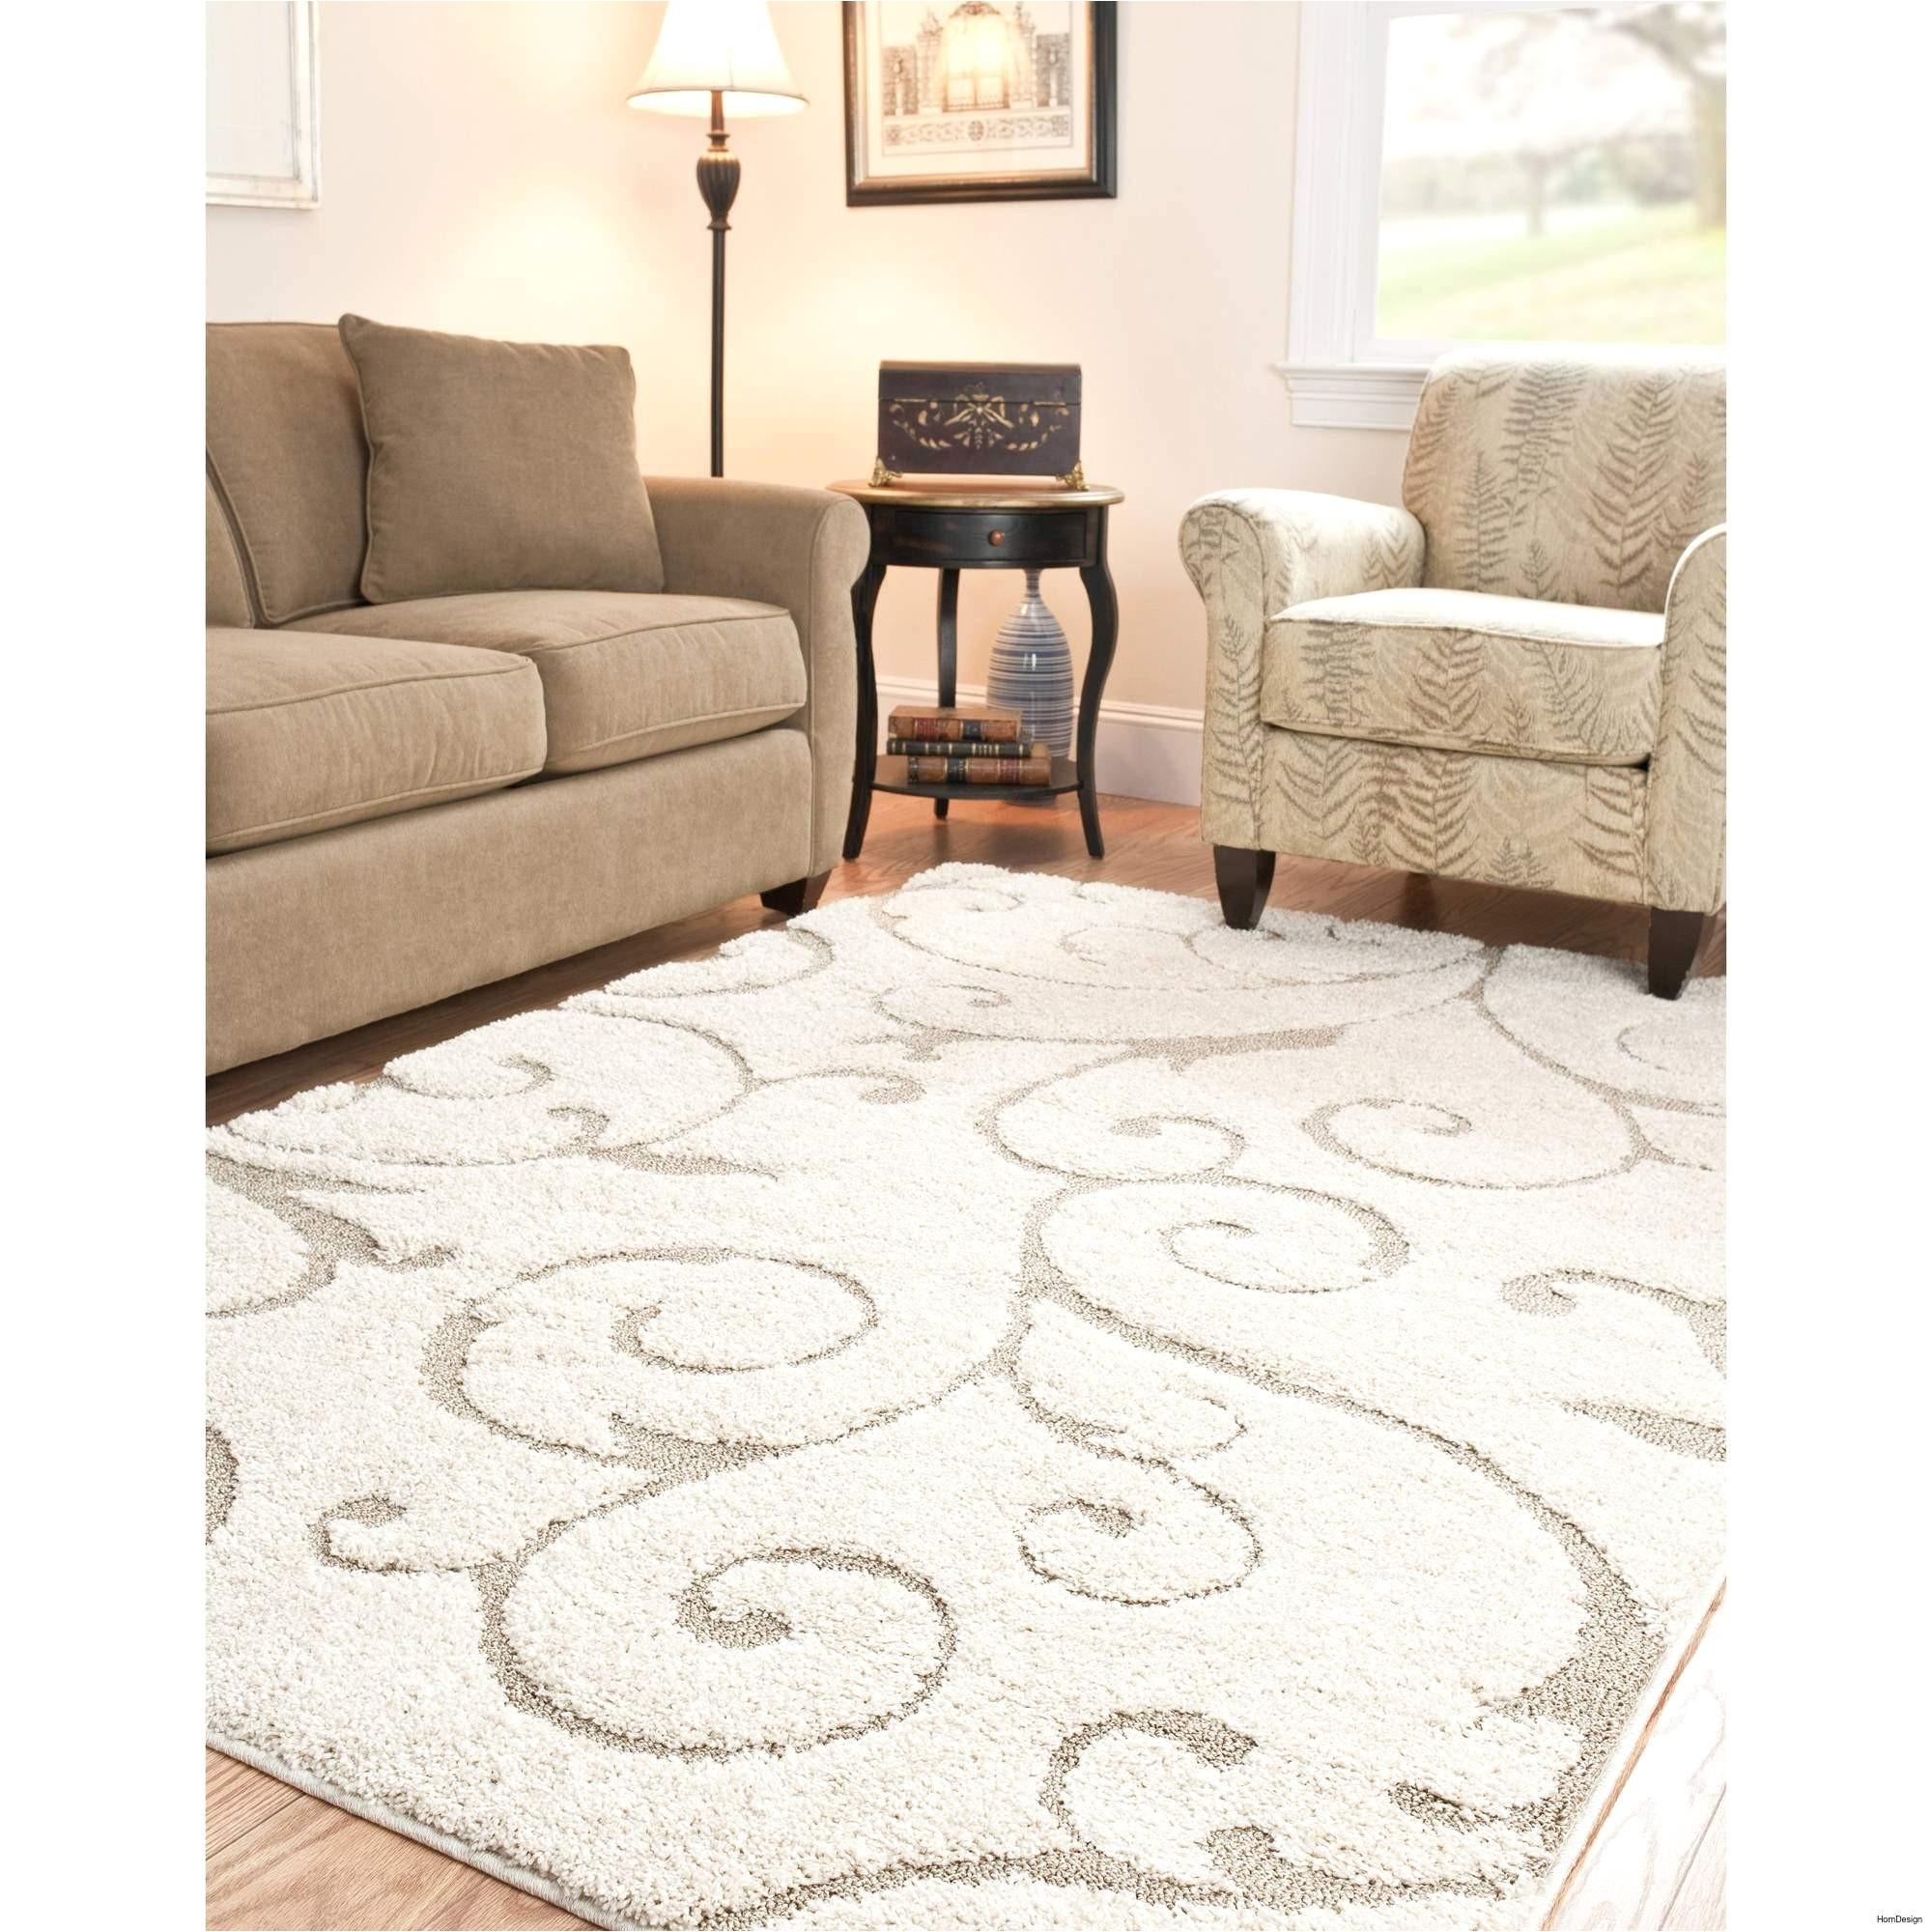 Sesame Street Bedroom Rug How to Buy An area Rug for Living Room Unique Living Room Carpet